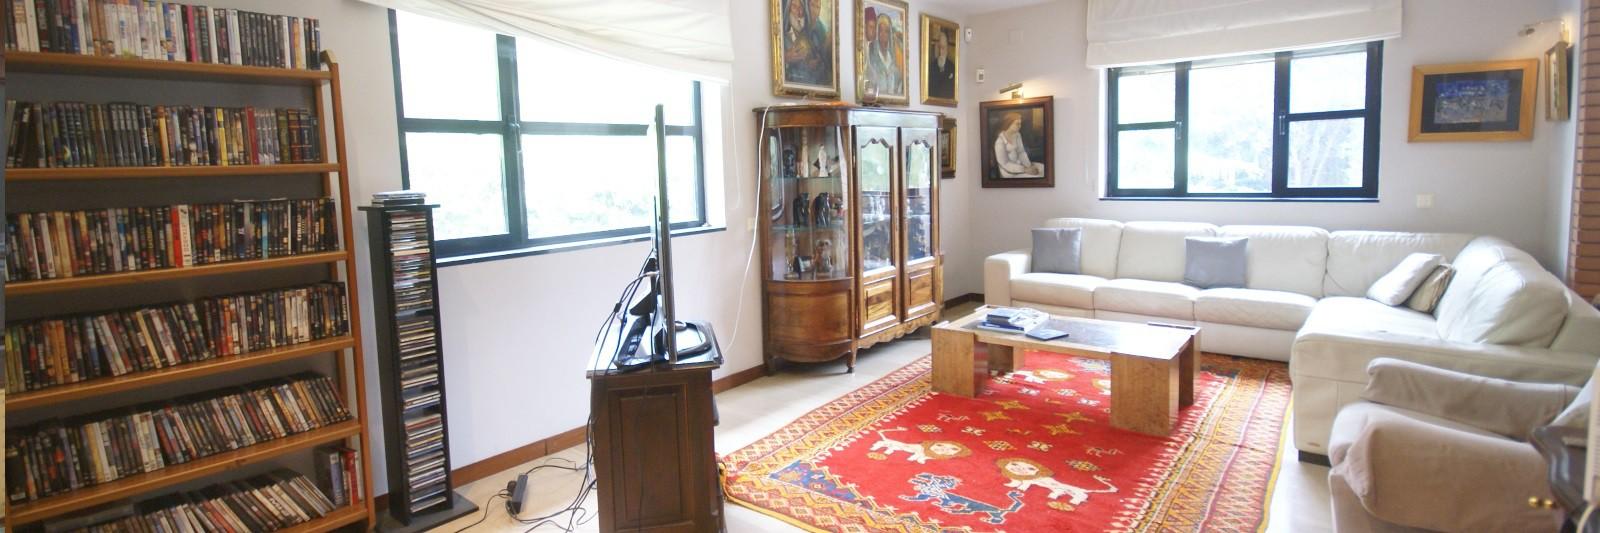 MG Inmobiliaria Sant CUgat - casa-parc-central